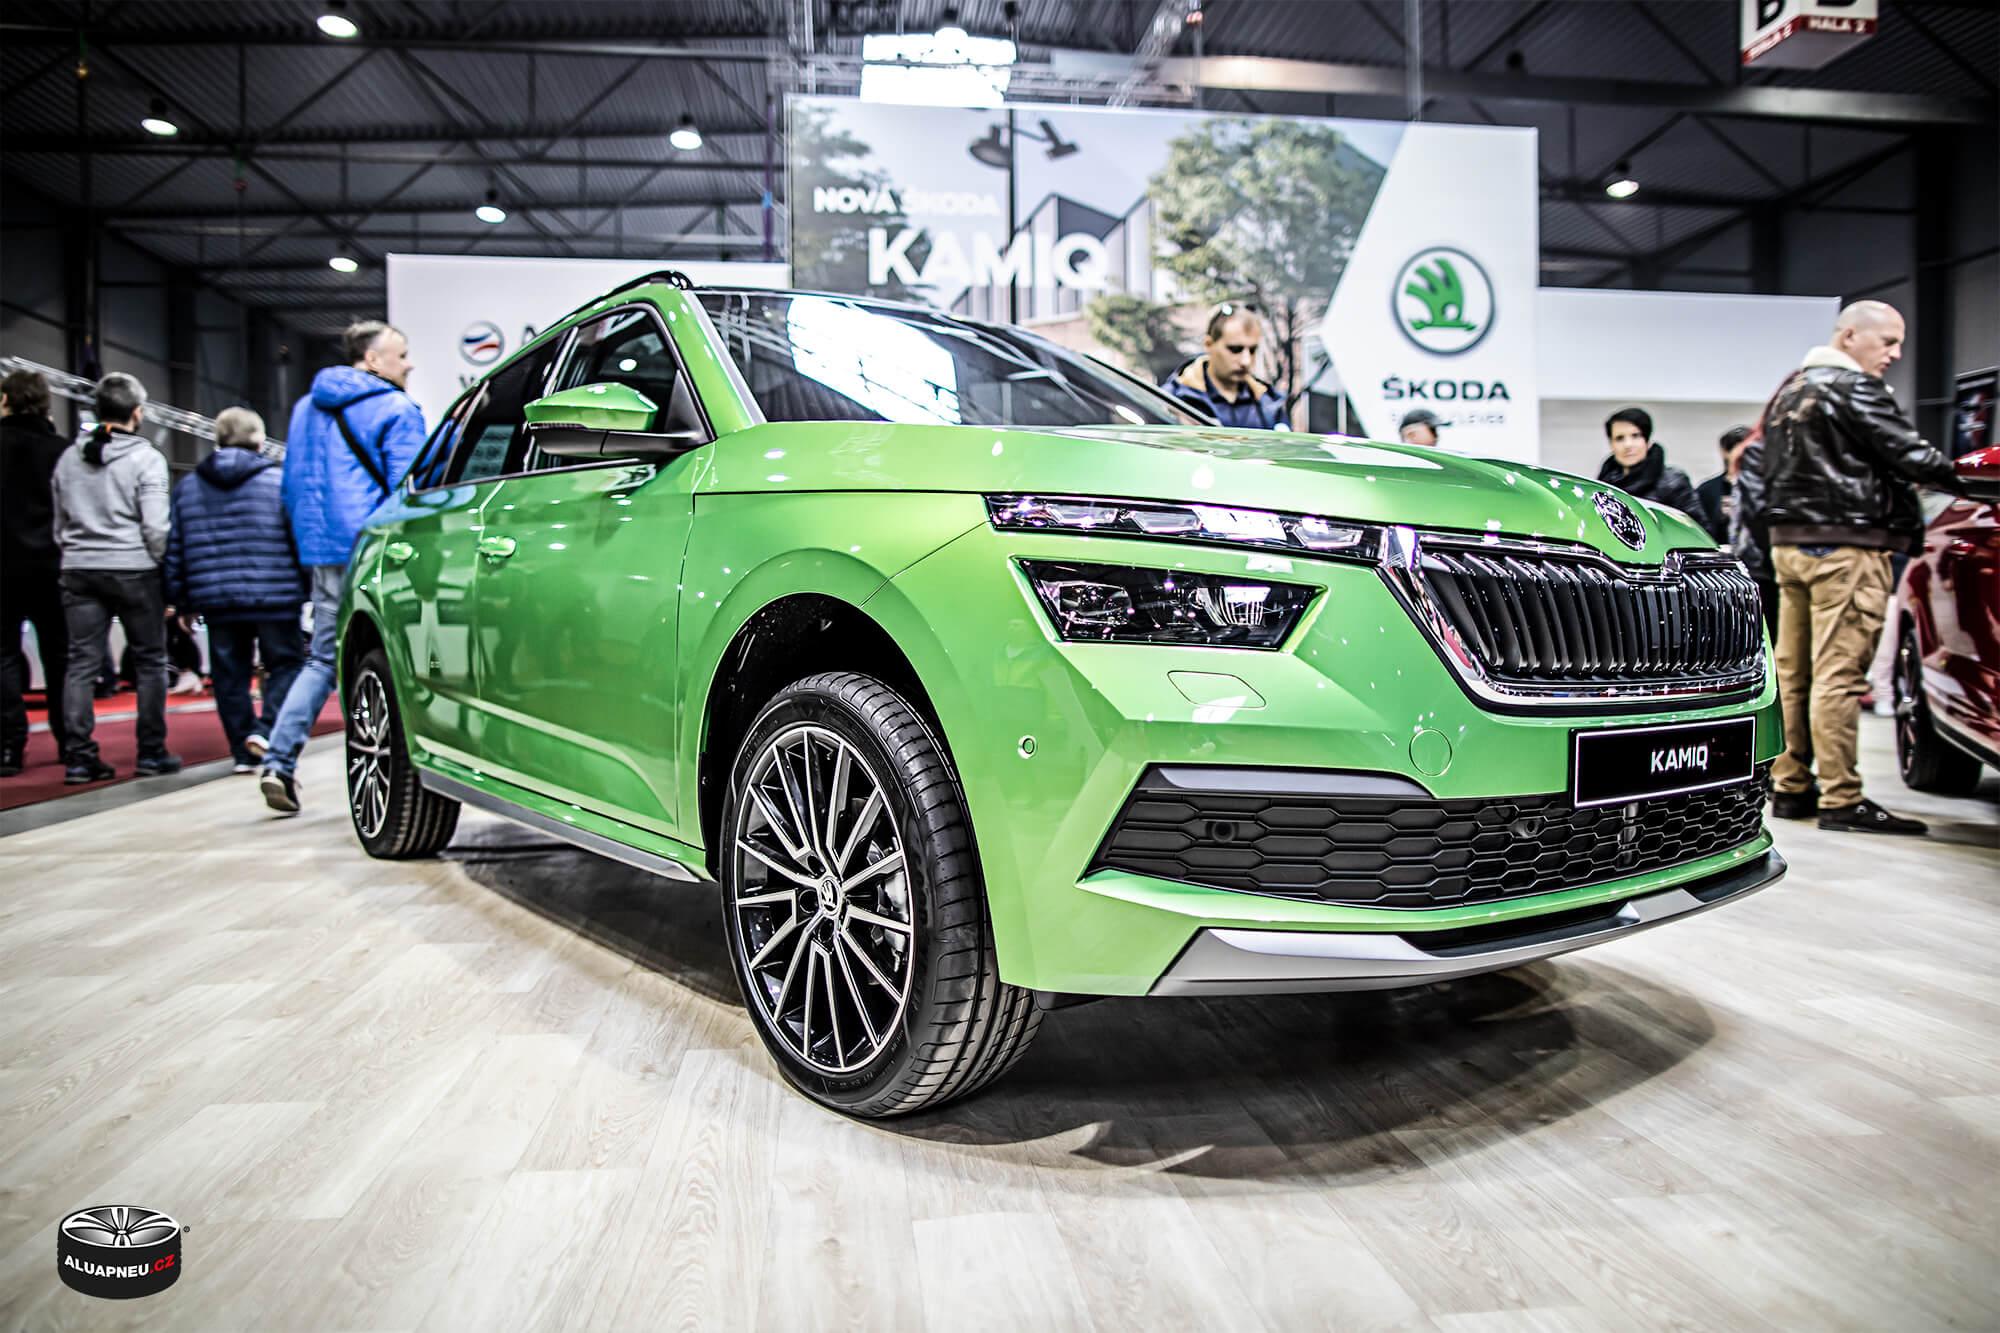 Škoda Kamiq - originální leštěné elektrony Škoda - Autosalon Praha 2019 - www.aluapneu.cz